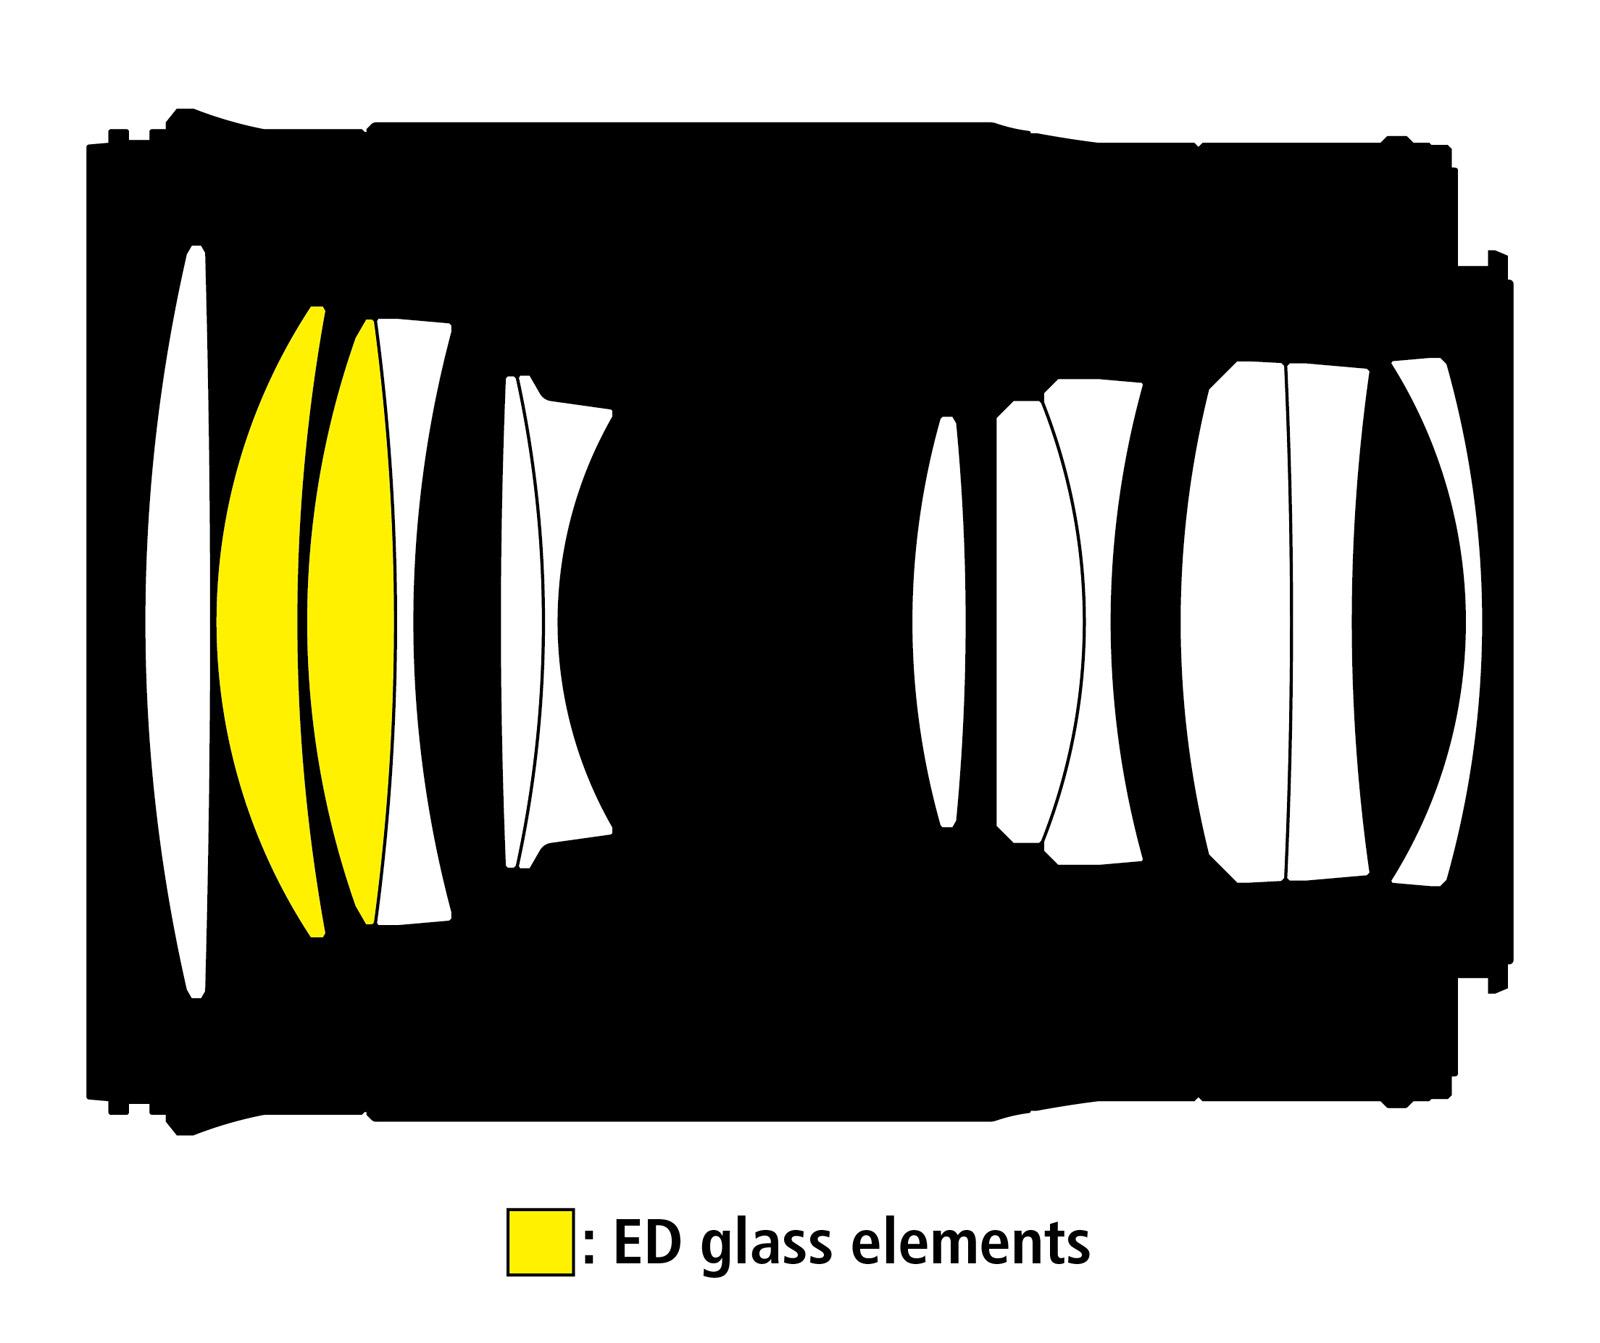 Оптическая схема объектива Nikon Nikkor Z 85mm f/1.8 S